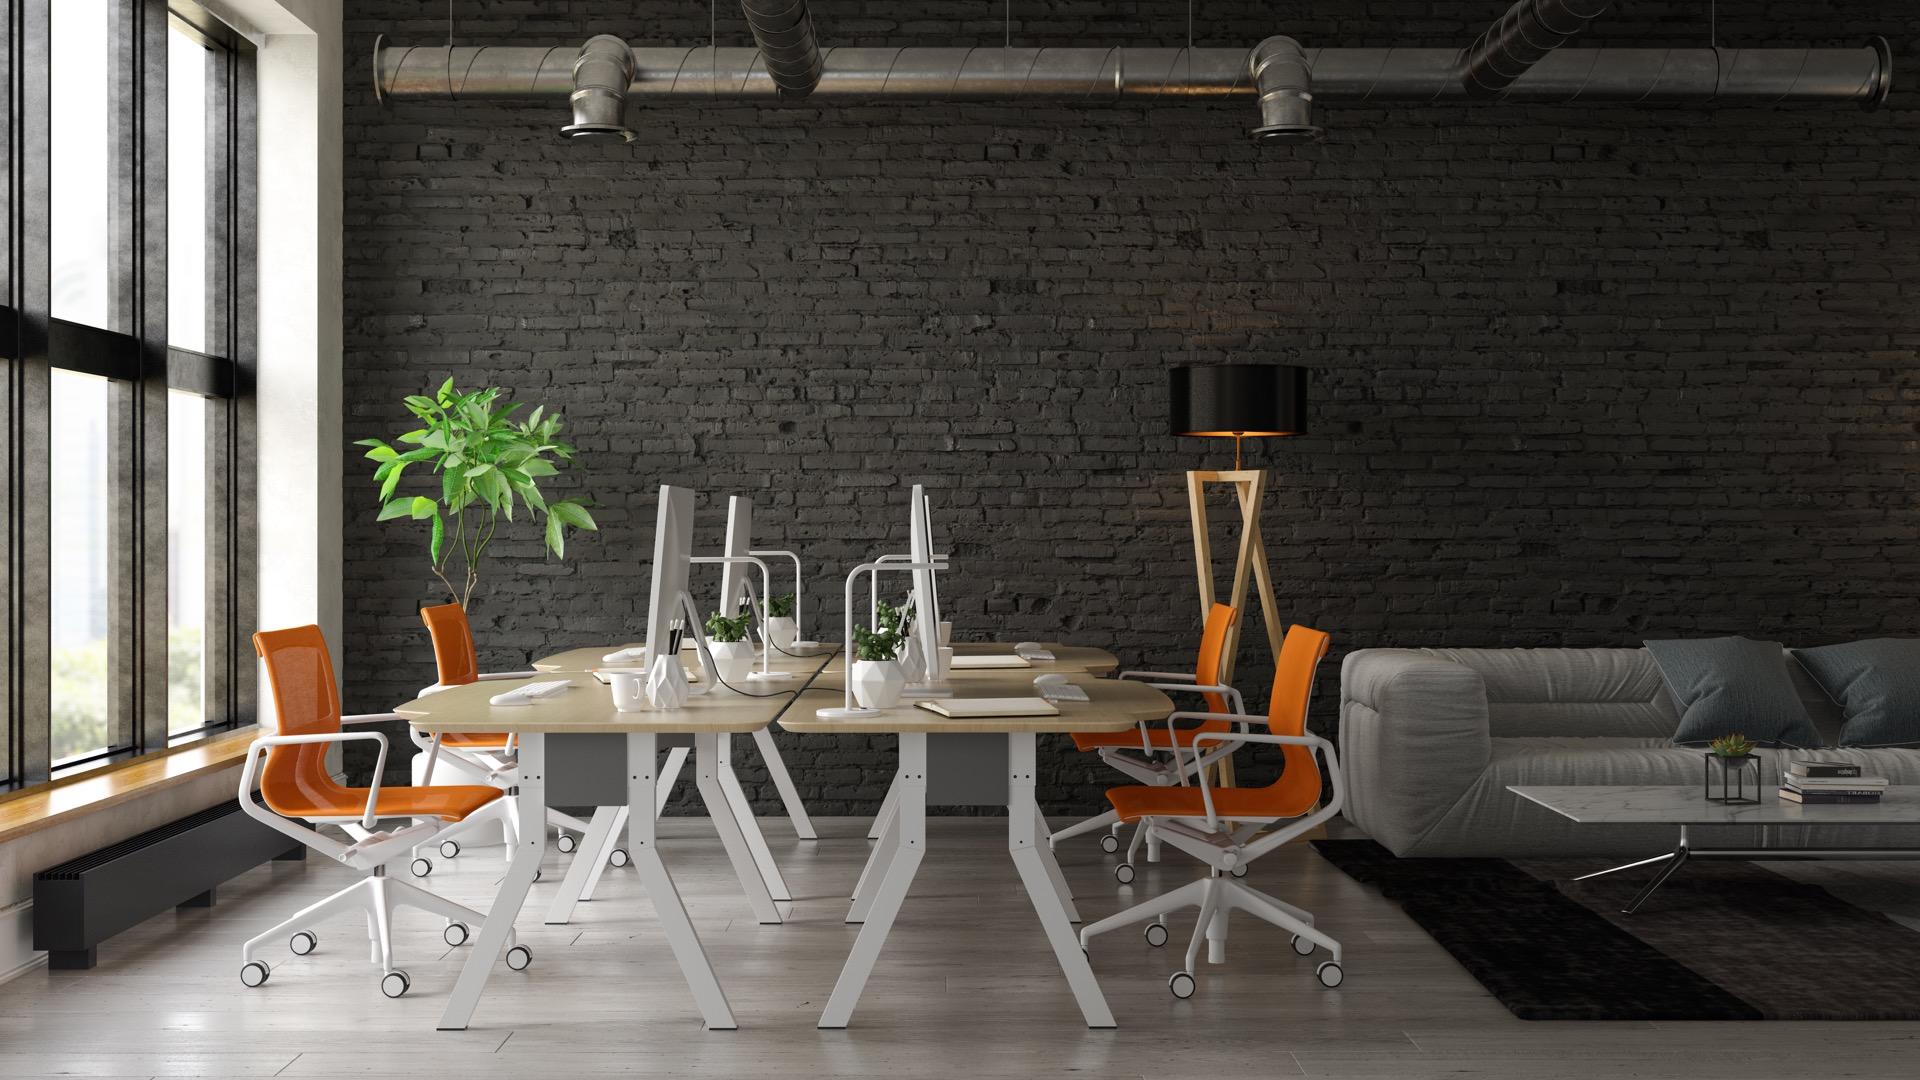 https://i-rebuild.com/wp-content/uploads/2020/11/Interior-of-modern-living-room-3D-rendering-.jpg